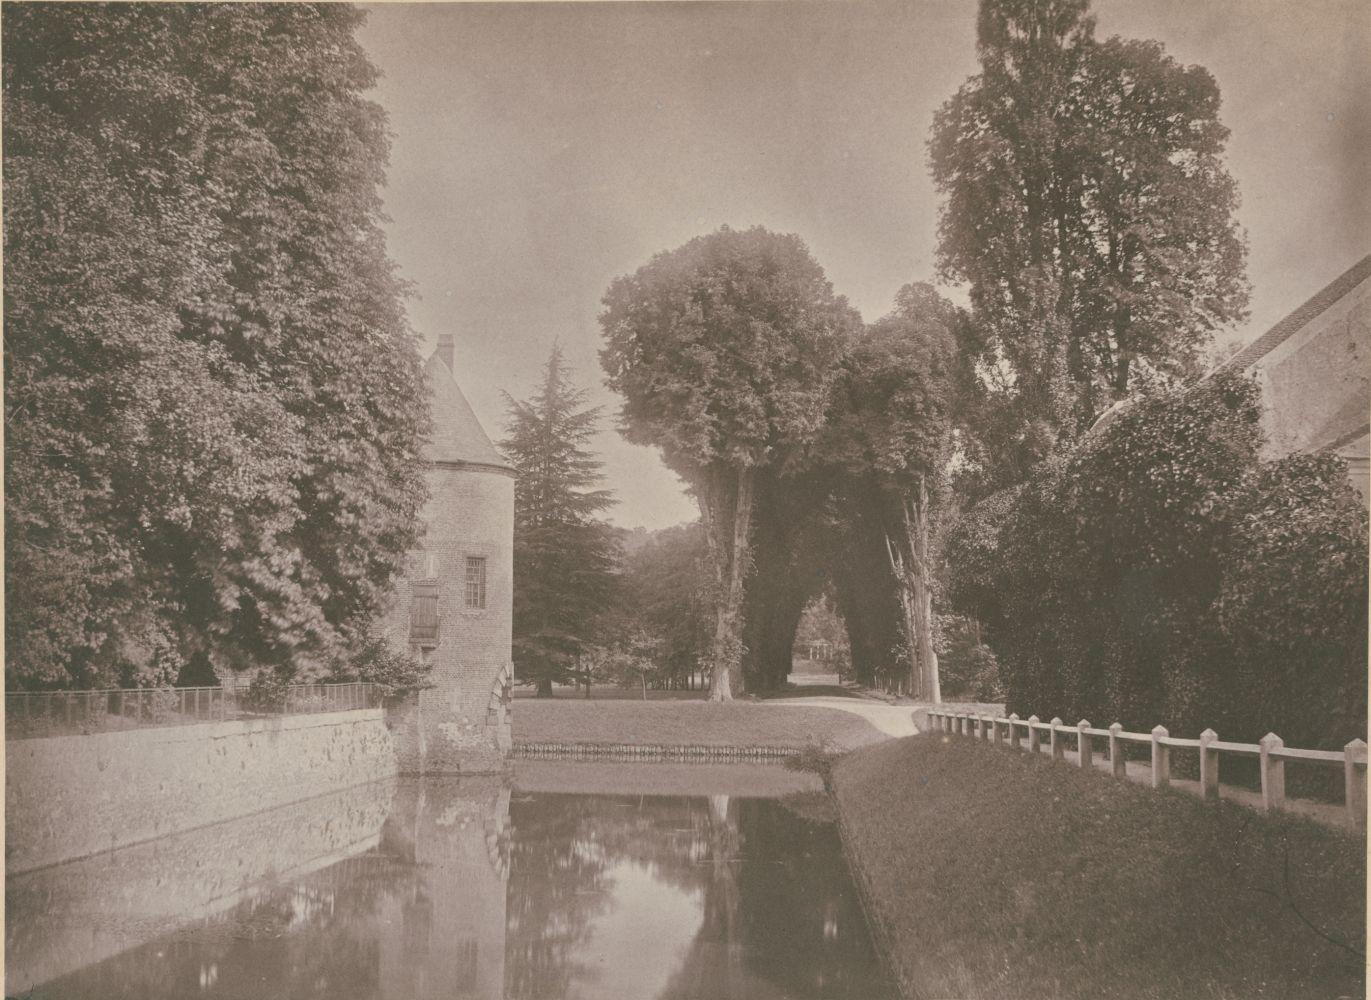 Joseph vicomte VIGIER (French, 1821-1894) Chateau de Grand-Vaux, Savigny sur Orge, the family home of Vigier, circa 1855 Coated salt or albumen print from a paper negative 17.3 x 23.5 cm mounted on 20.6 x 29.2 cm album page